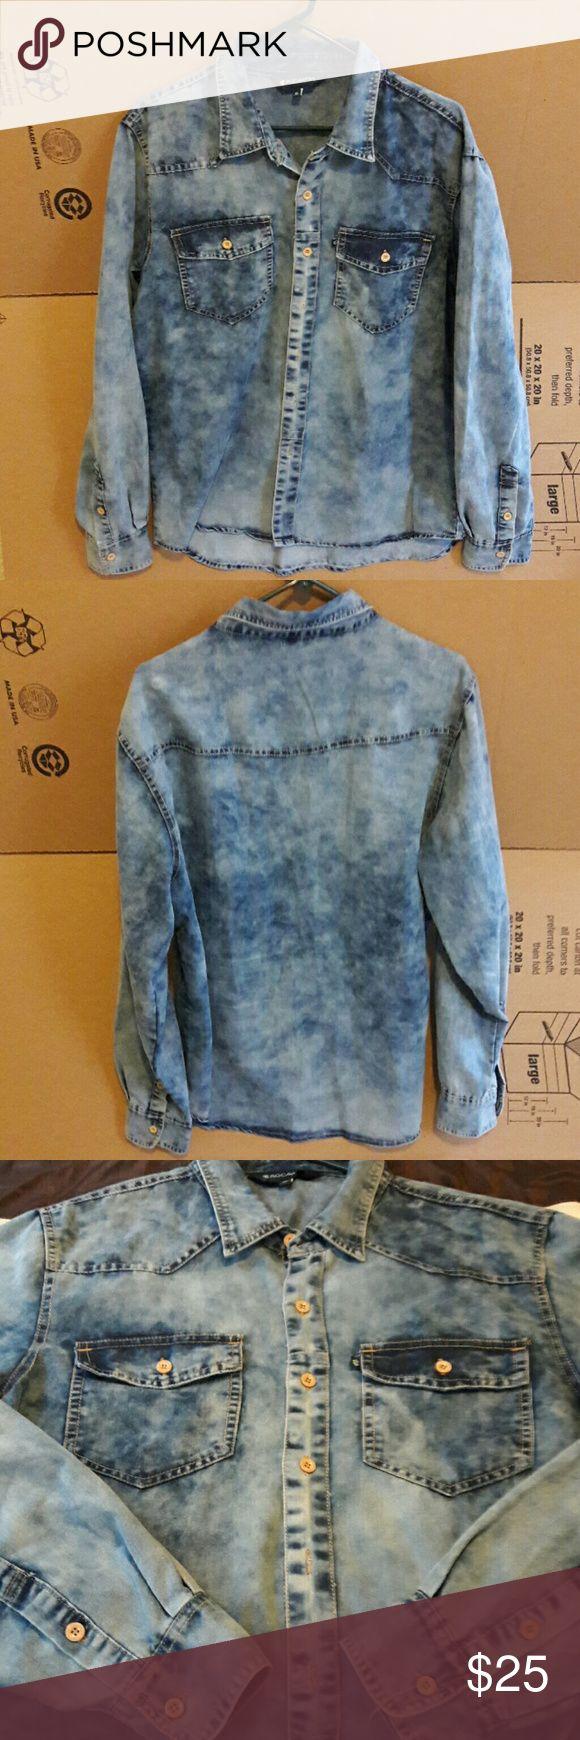 Stonewash Denim Button down Rocawear shirt EUC, worn once. No flaws, no stains, no rips. Rocawear Shirts Casual Button Down Shirts